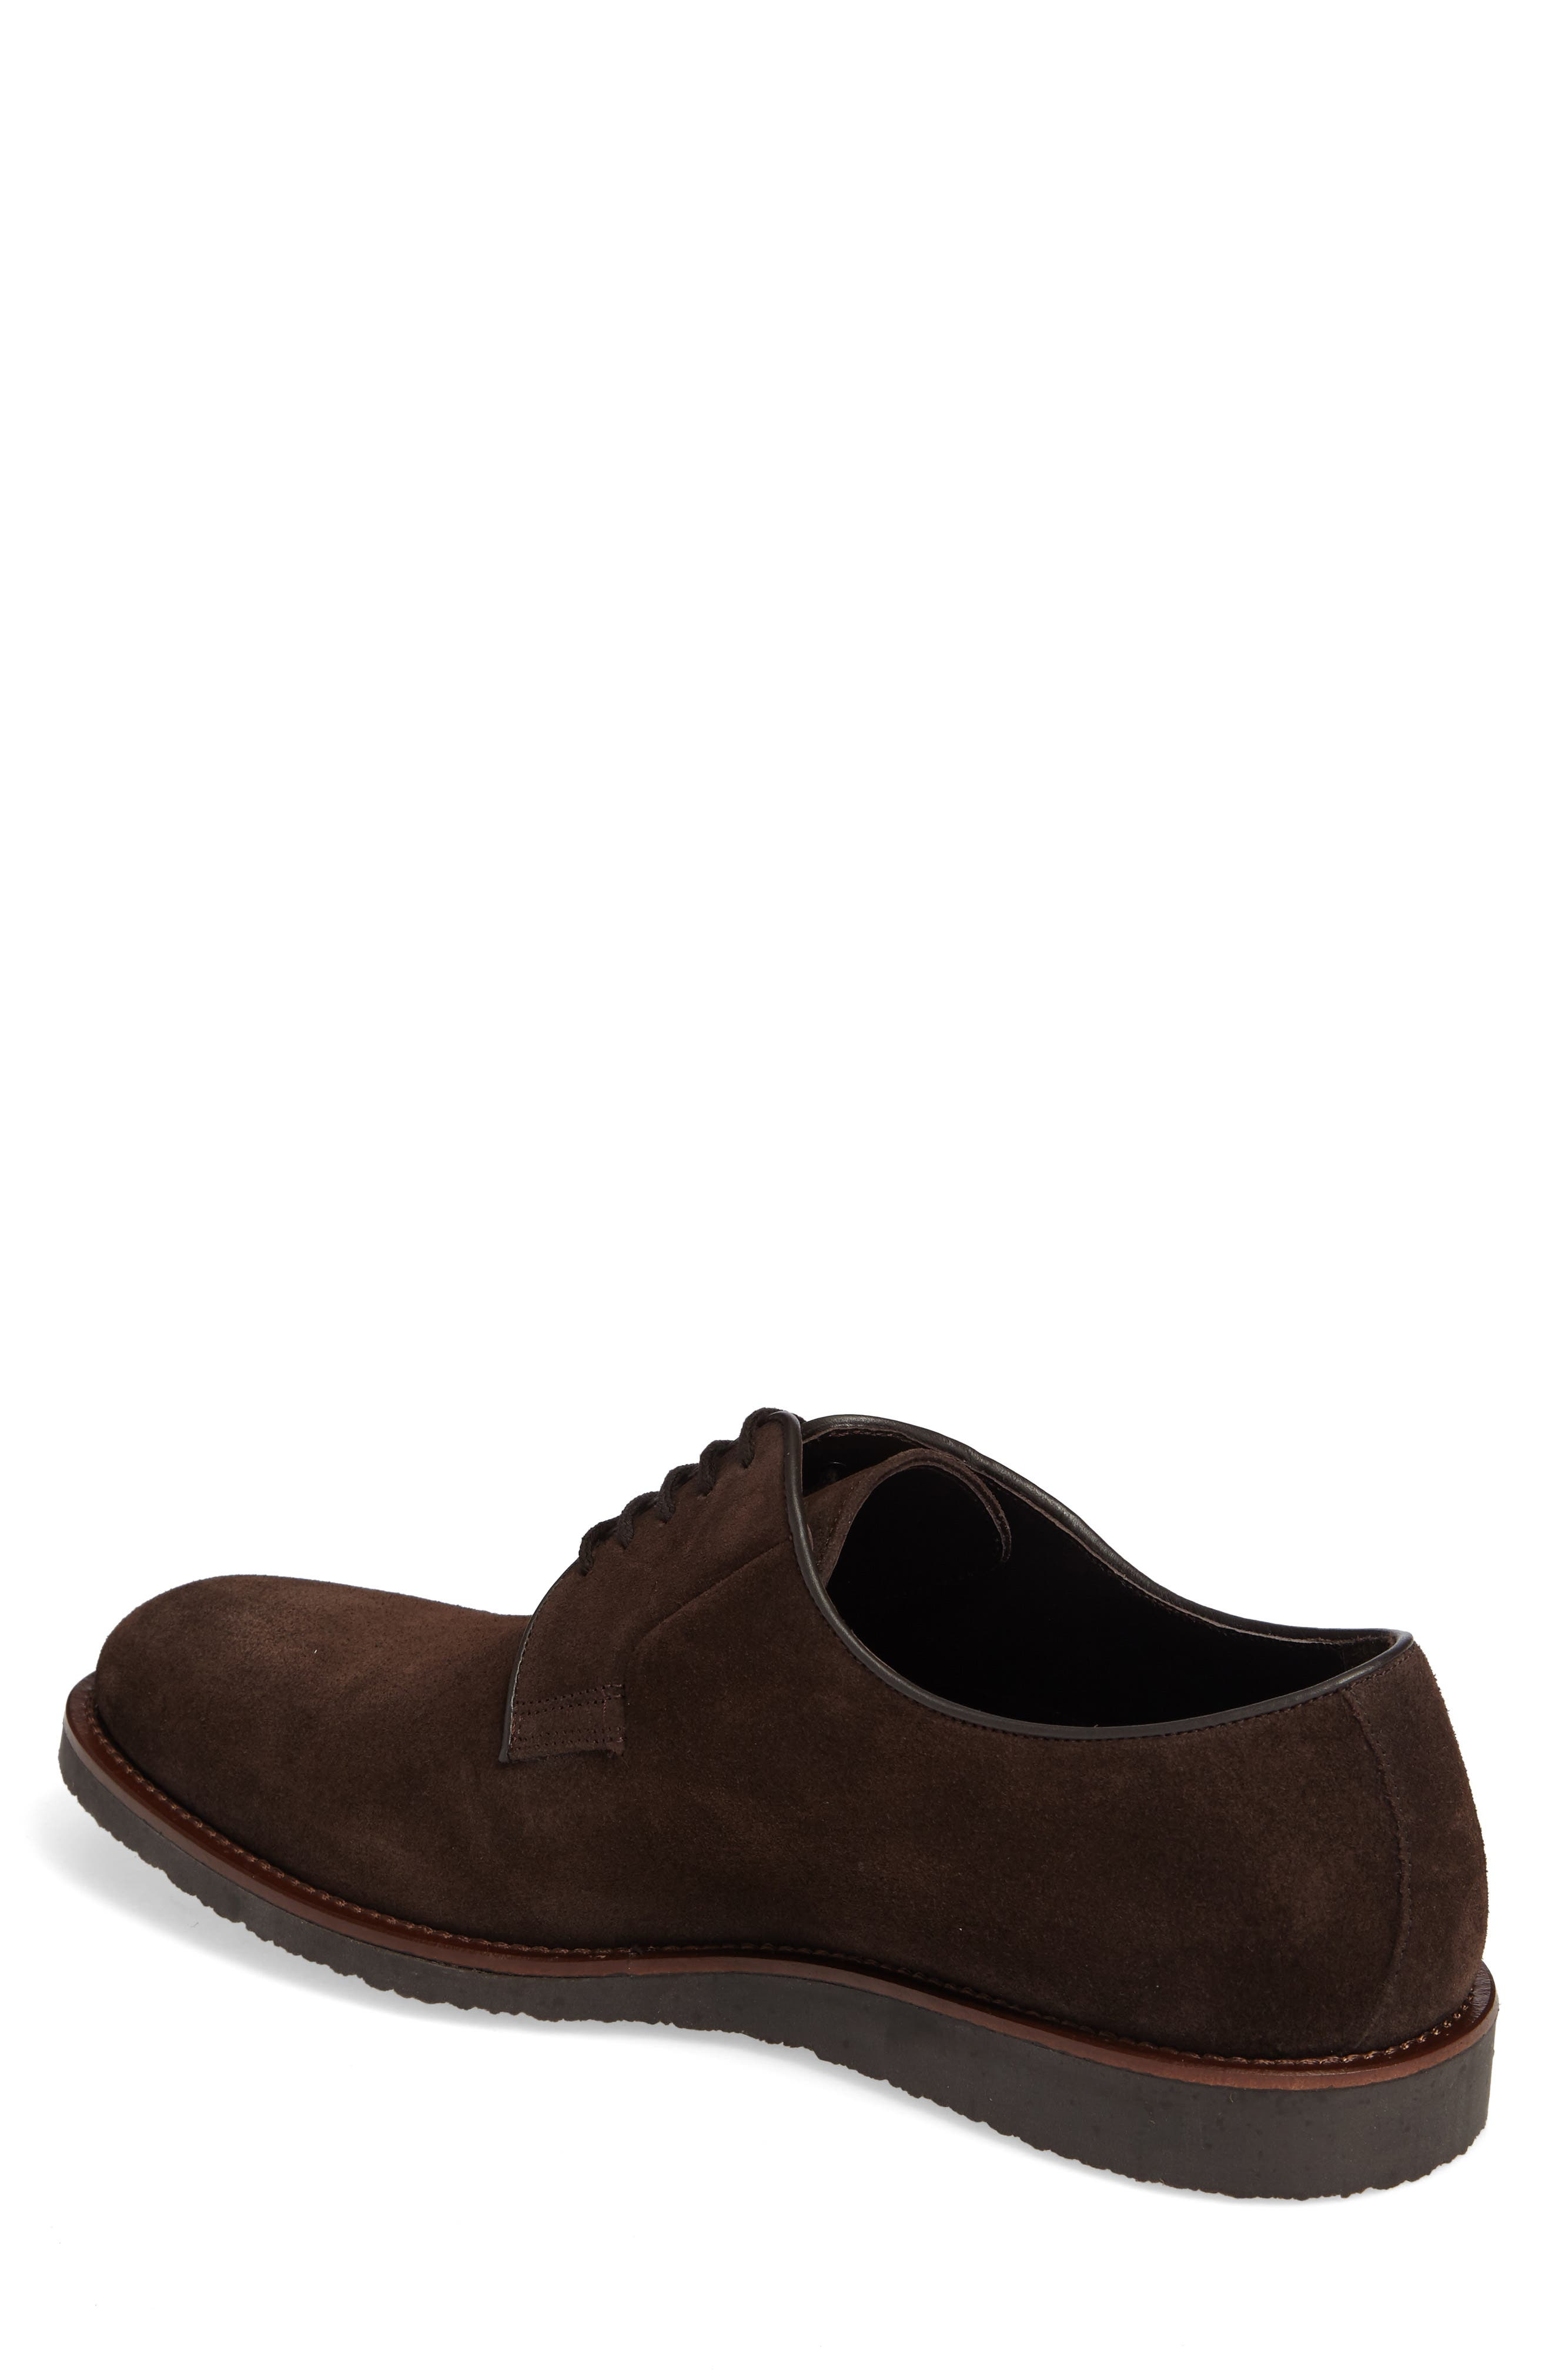 Samuel Plain-Toe Derby,                             Alternate thumbnail 2, color,                             Brown Suede Leather